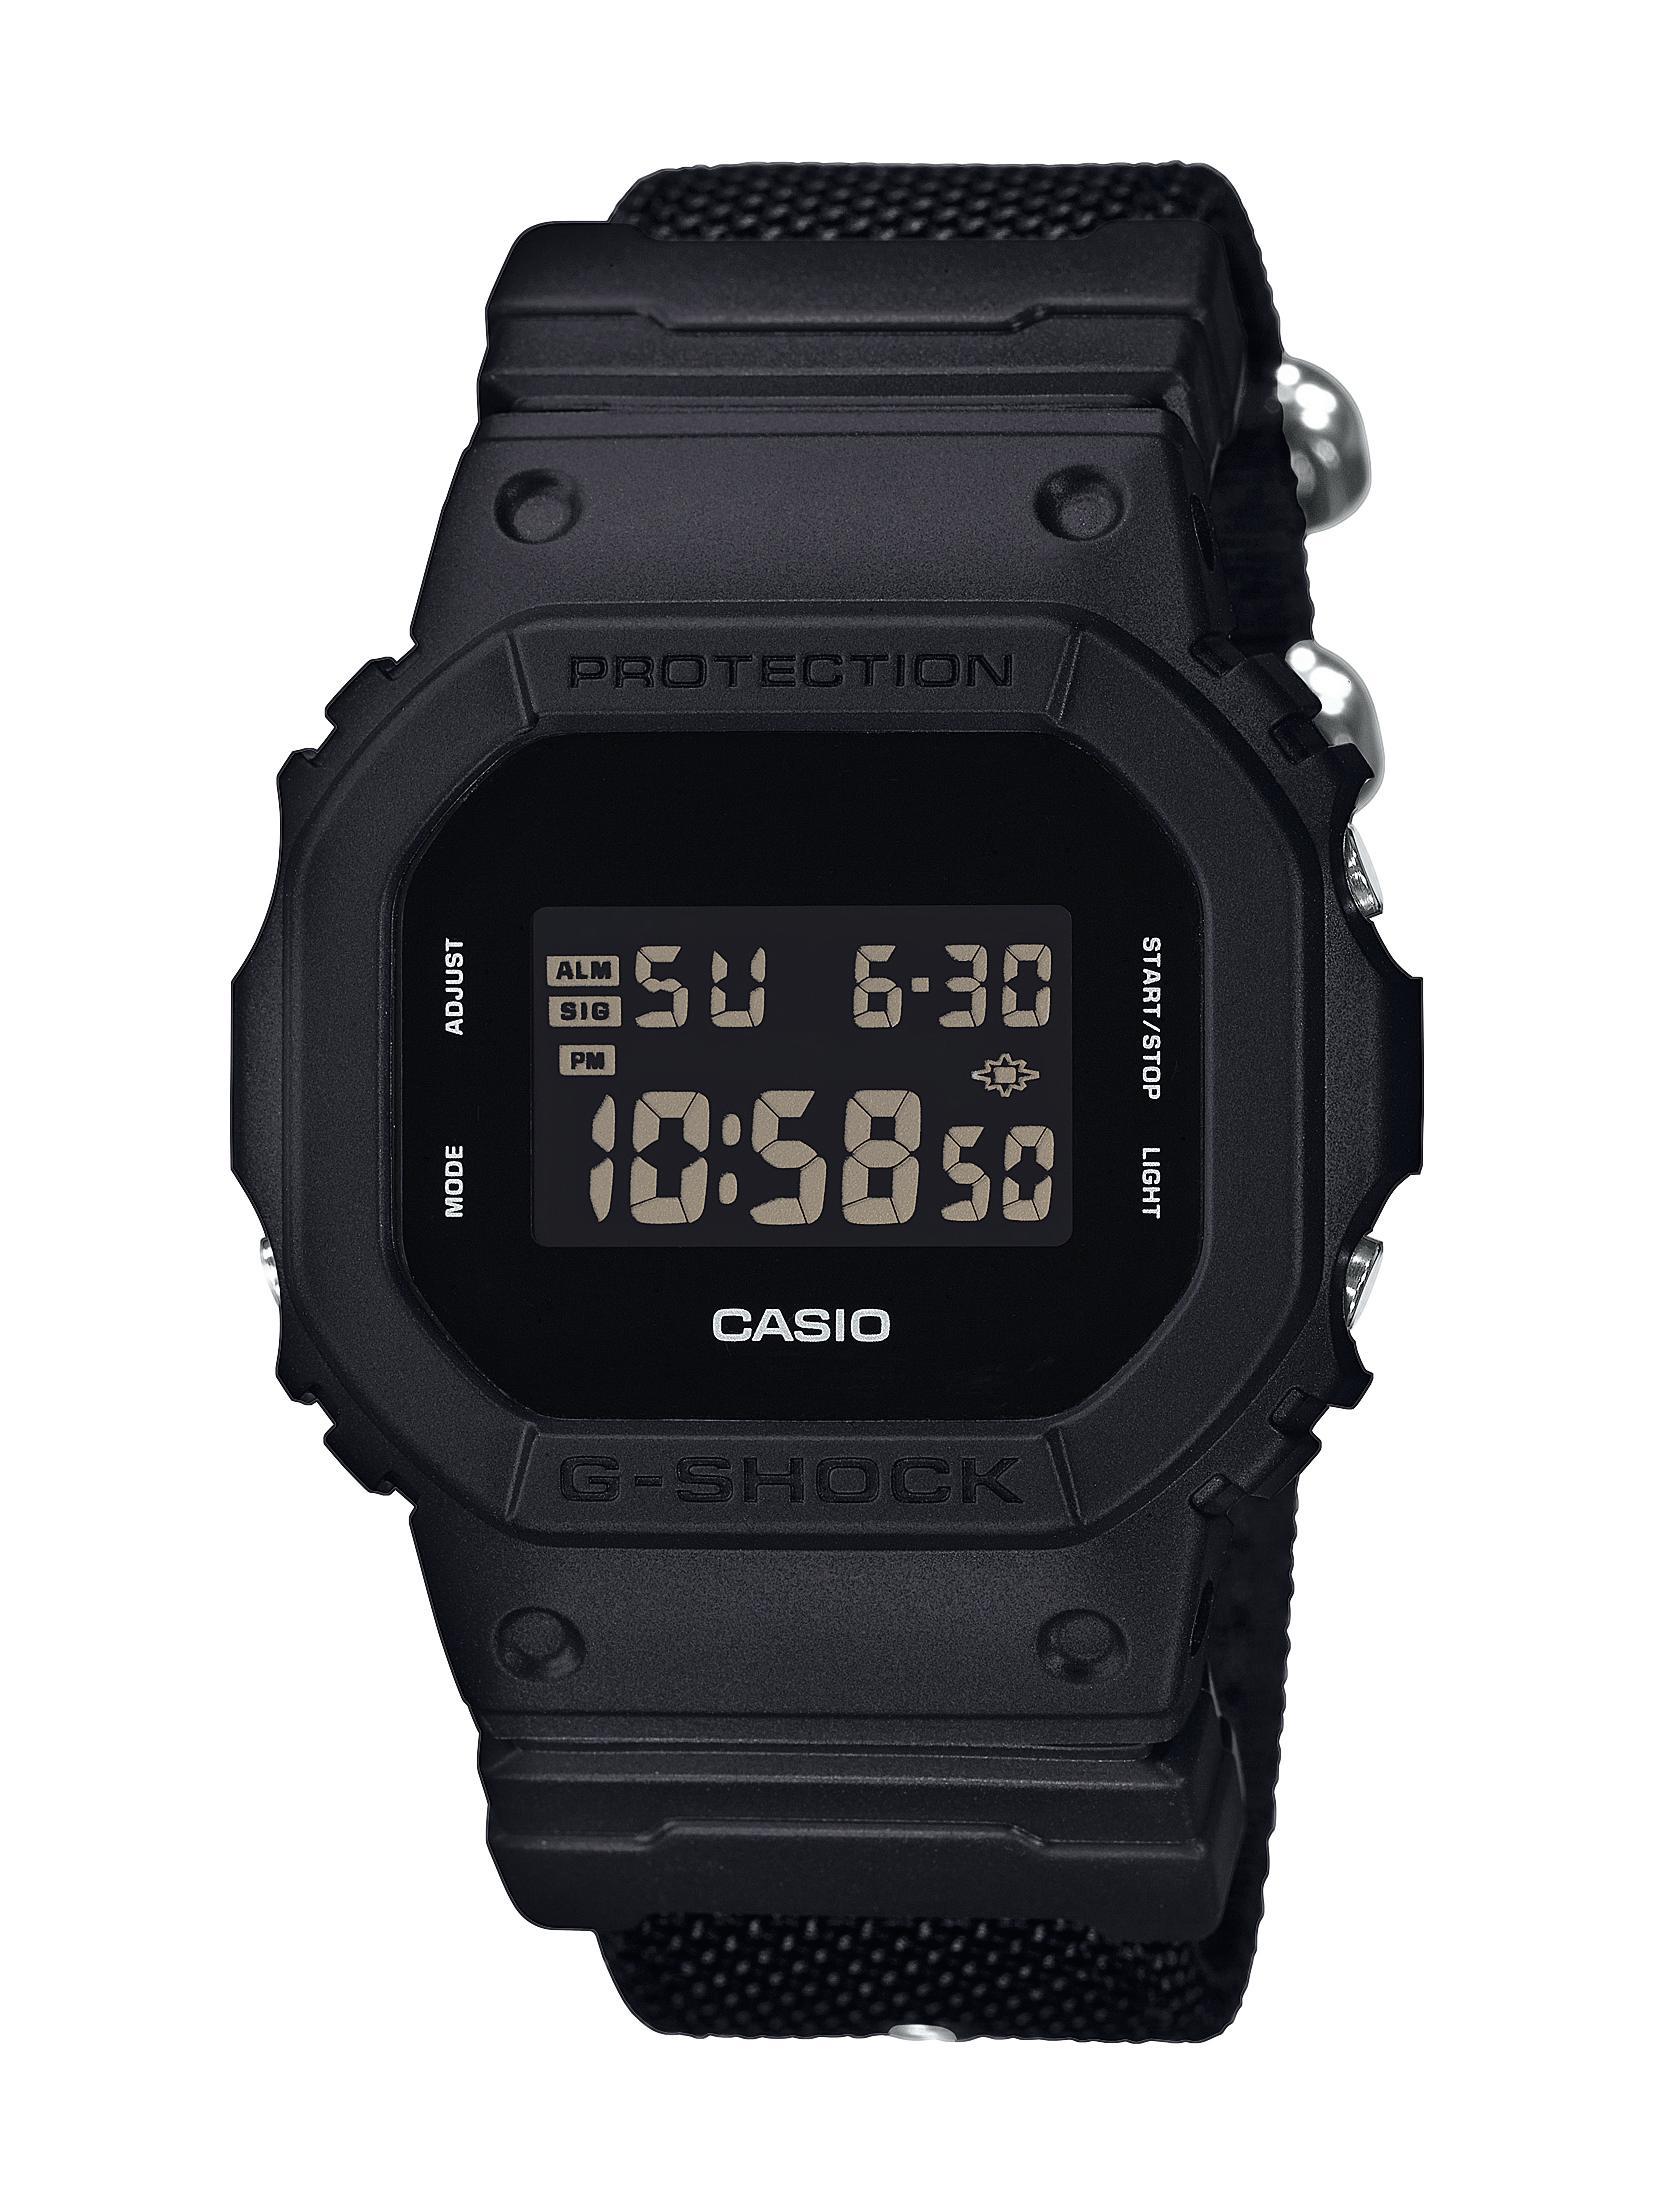 CASIO G-SHOCK Chronograph  DW-5600BBN-1ER  Preisvergleich